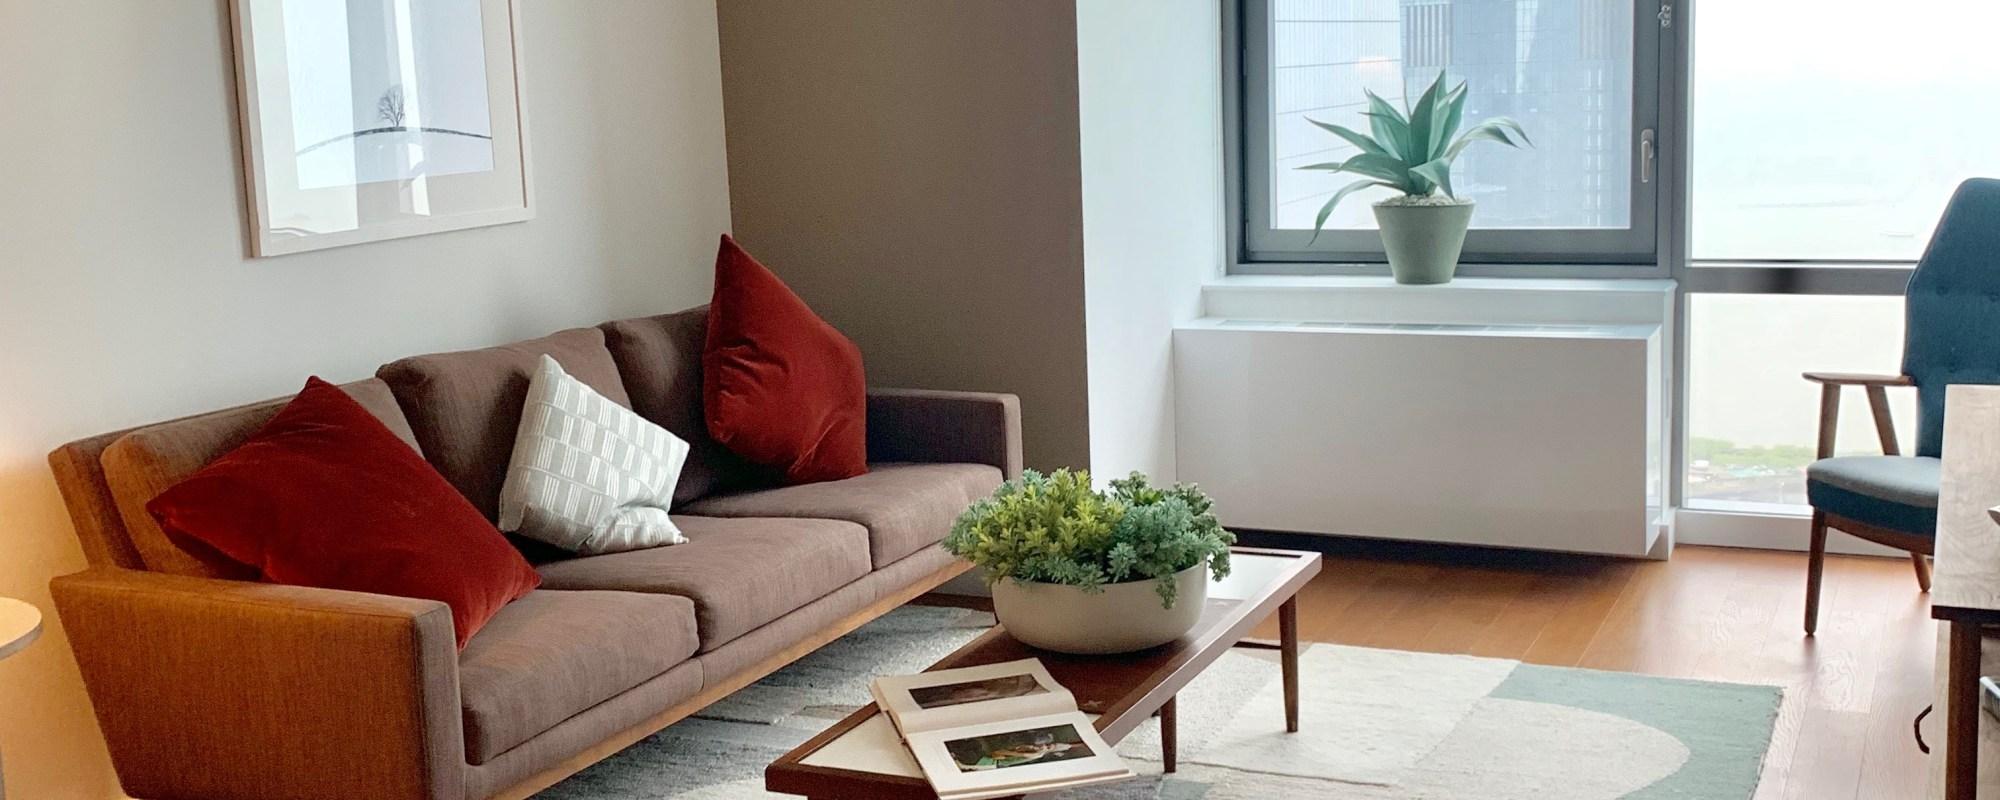 luxury hudson yards apartment